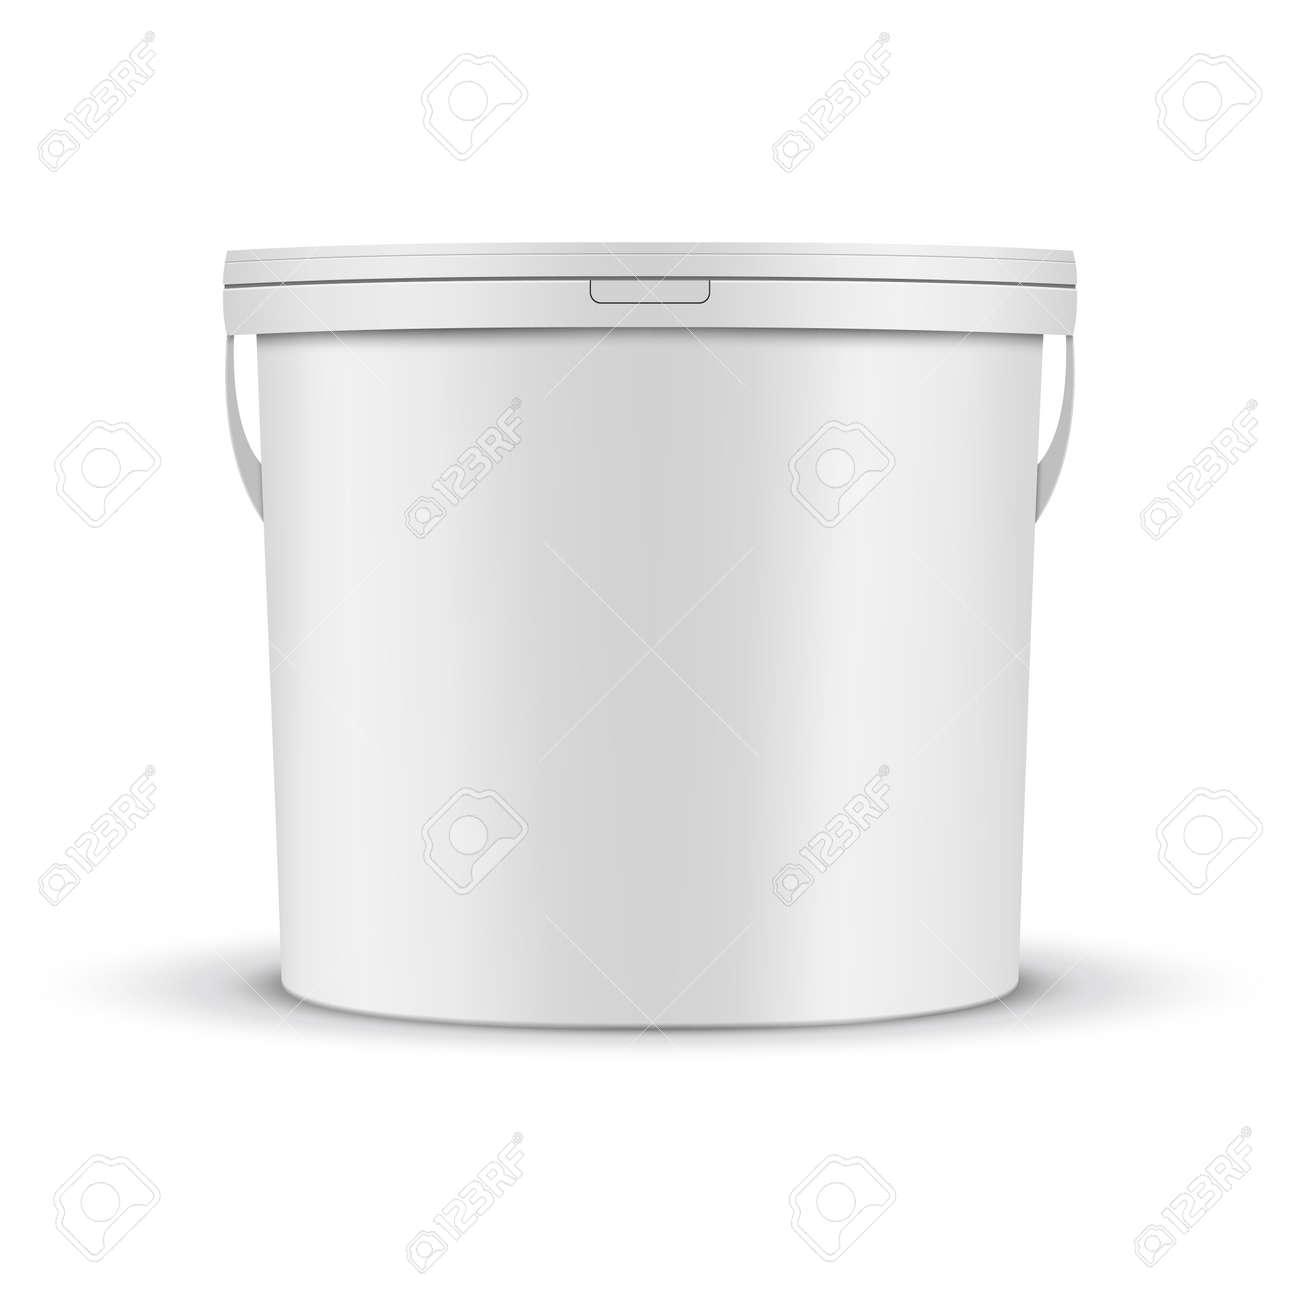 White Paint Bucket Mockup - 130027182